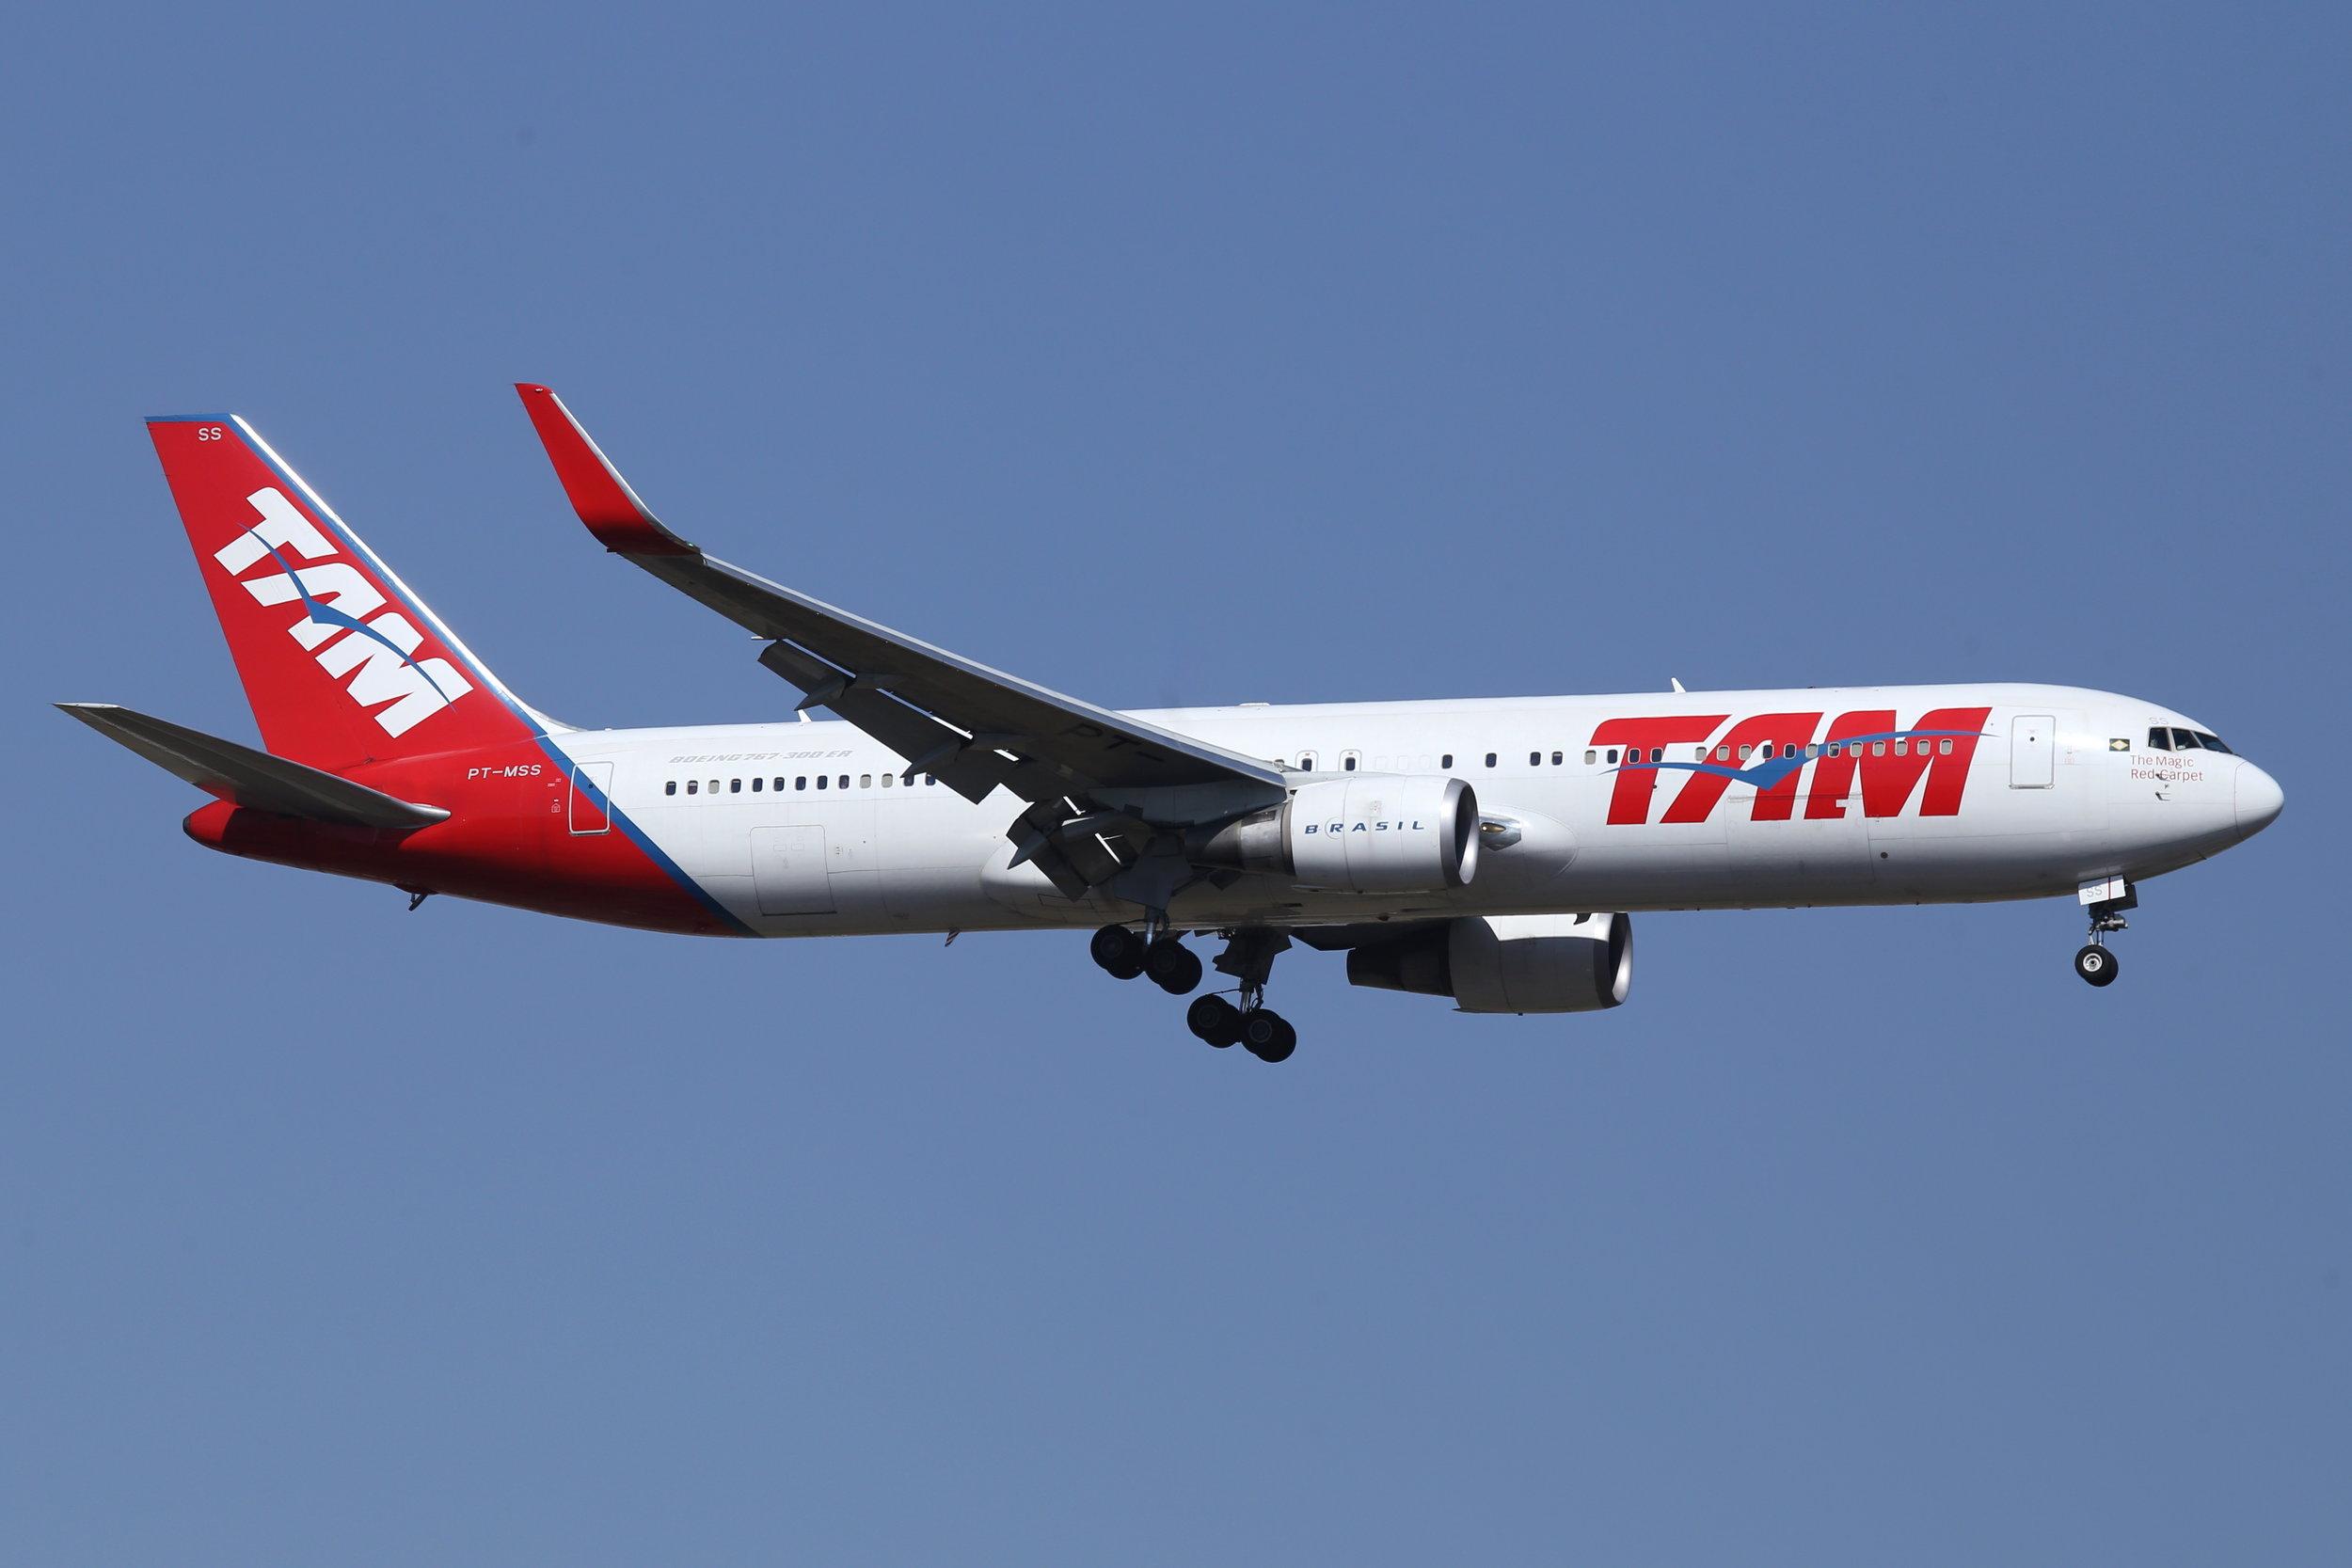 PT-MSS TAM B767 taken at Johannesburg 13th November 2018 by John Wood